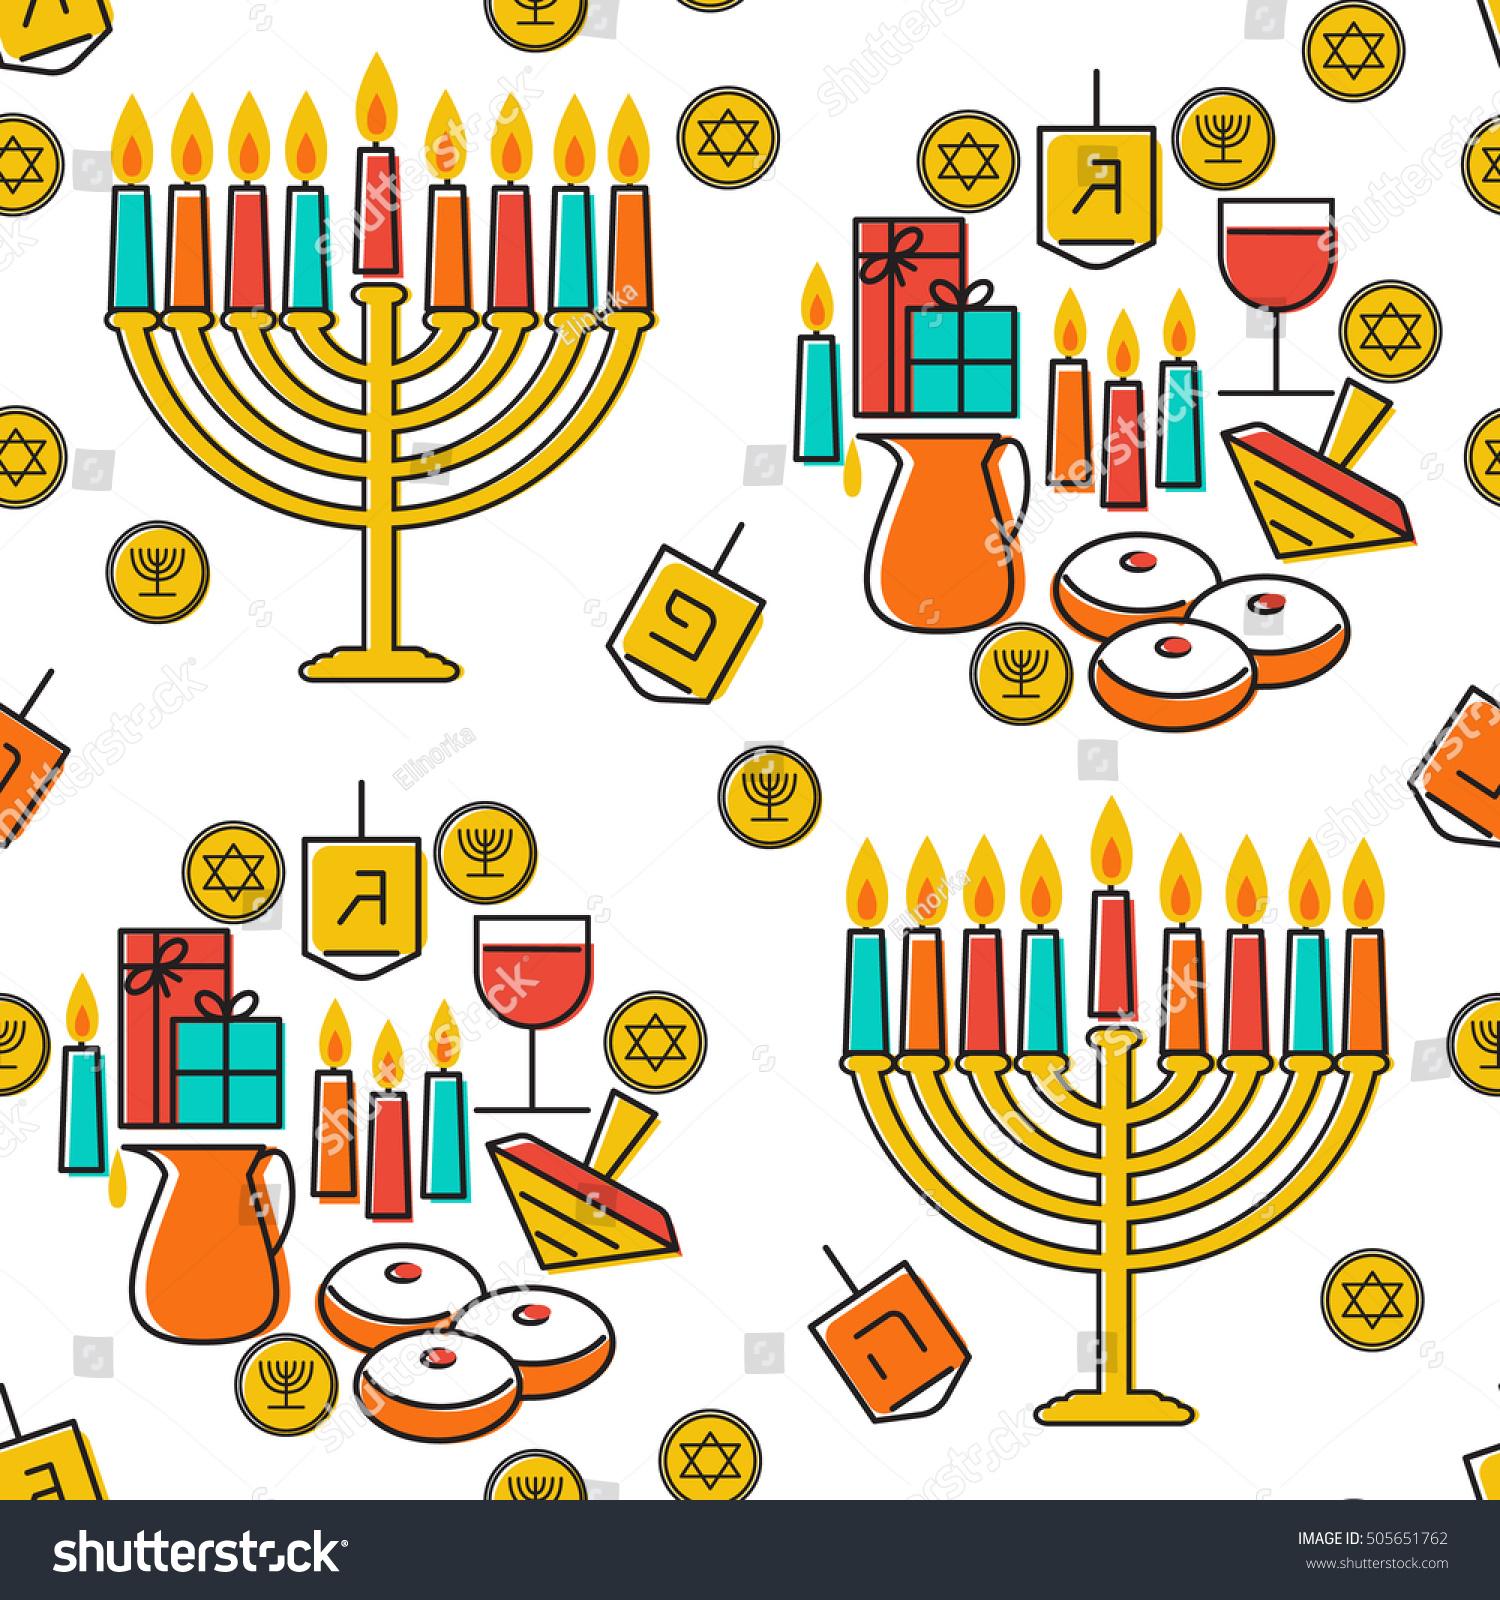 Uncategorized Chanukah Symbols hanukkah seamless pattern jewish holiday stock vector symbols menorah candlestick candles